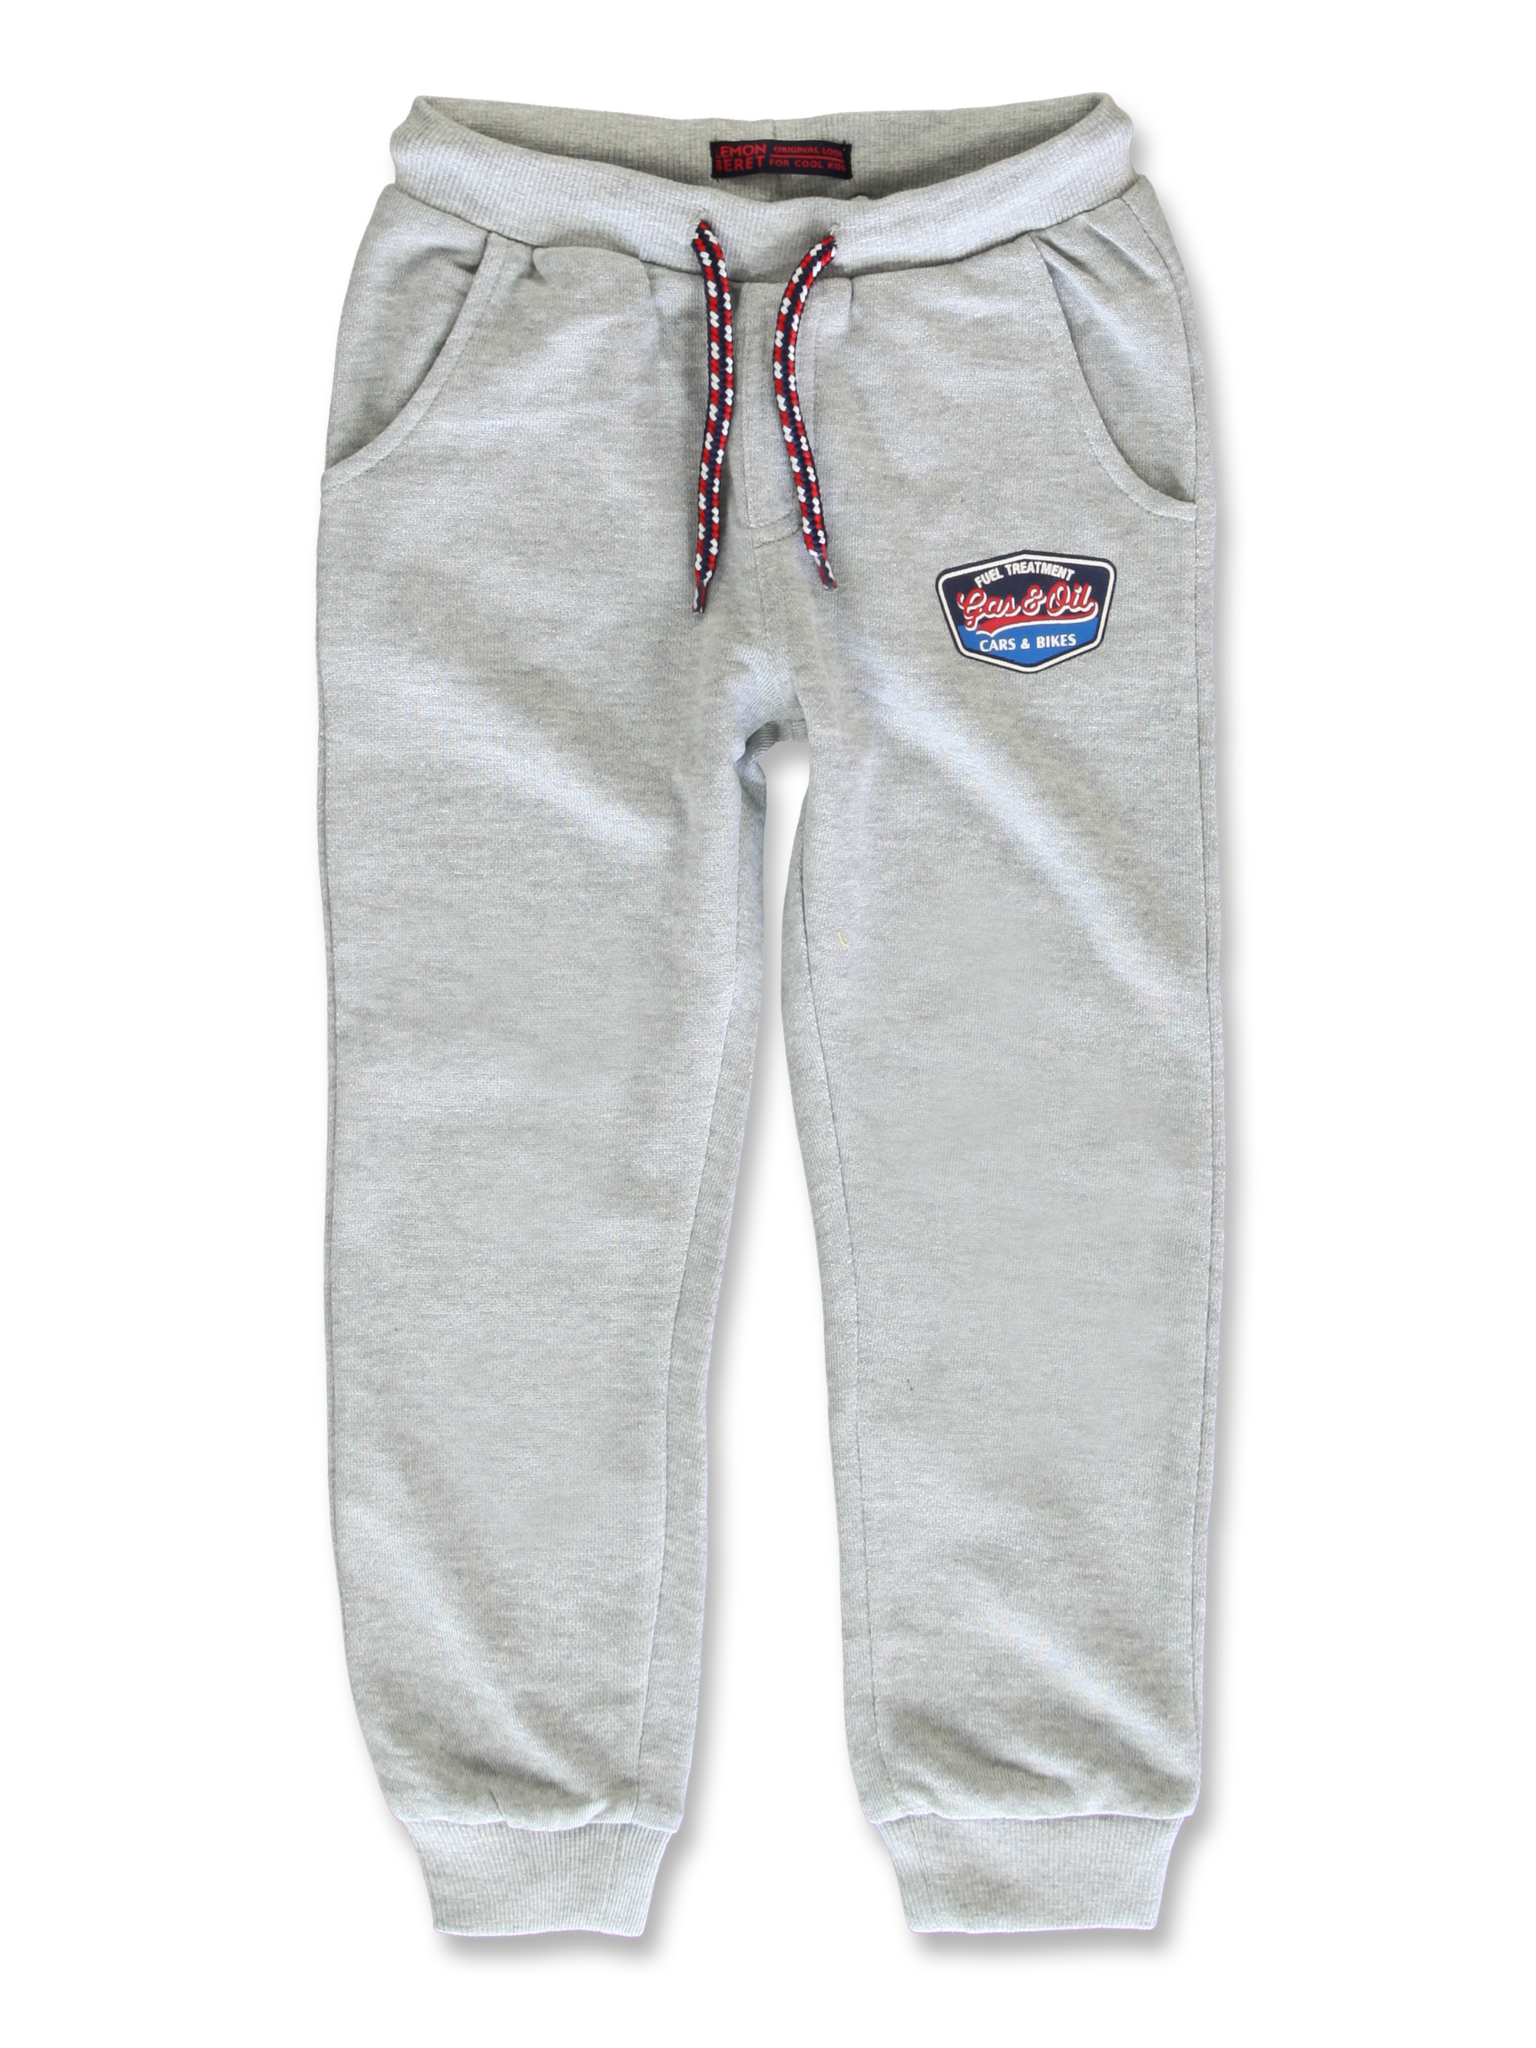 All Brands | Summerproducts Small Boys | Jogging Pant | 12 pcs/box